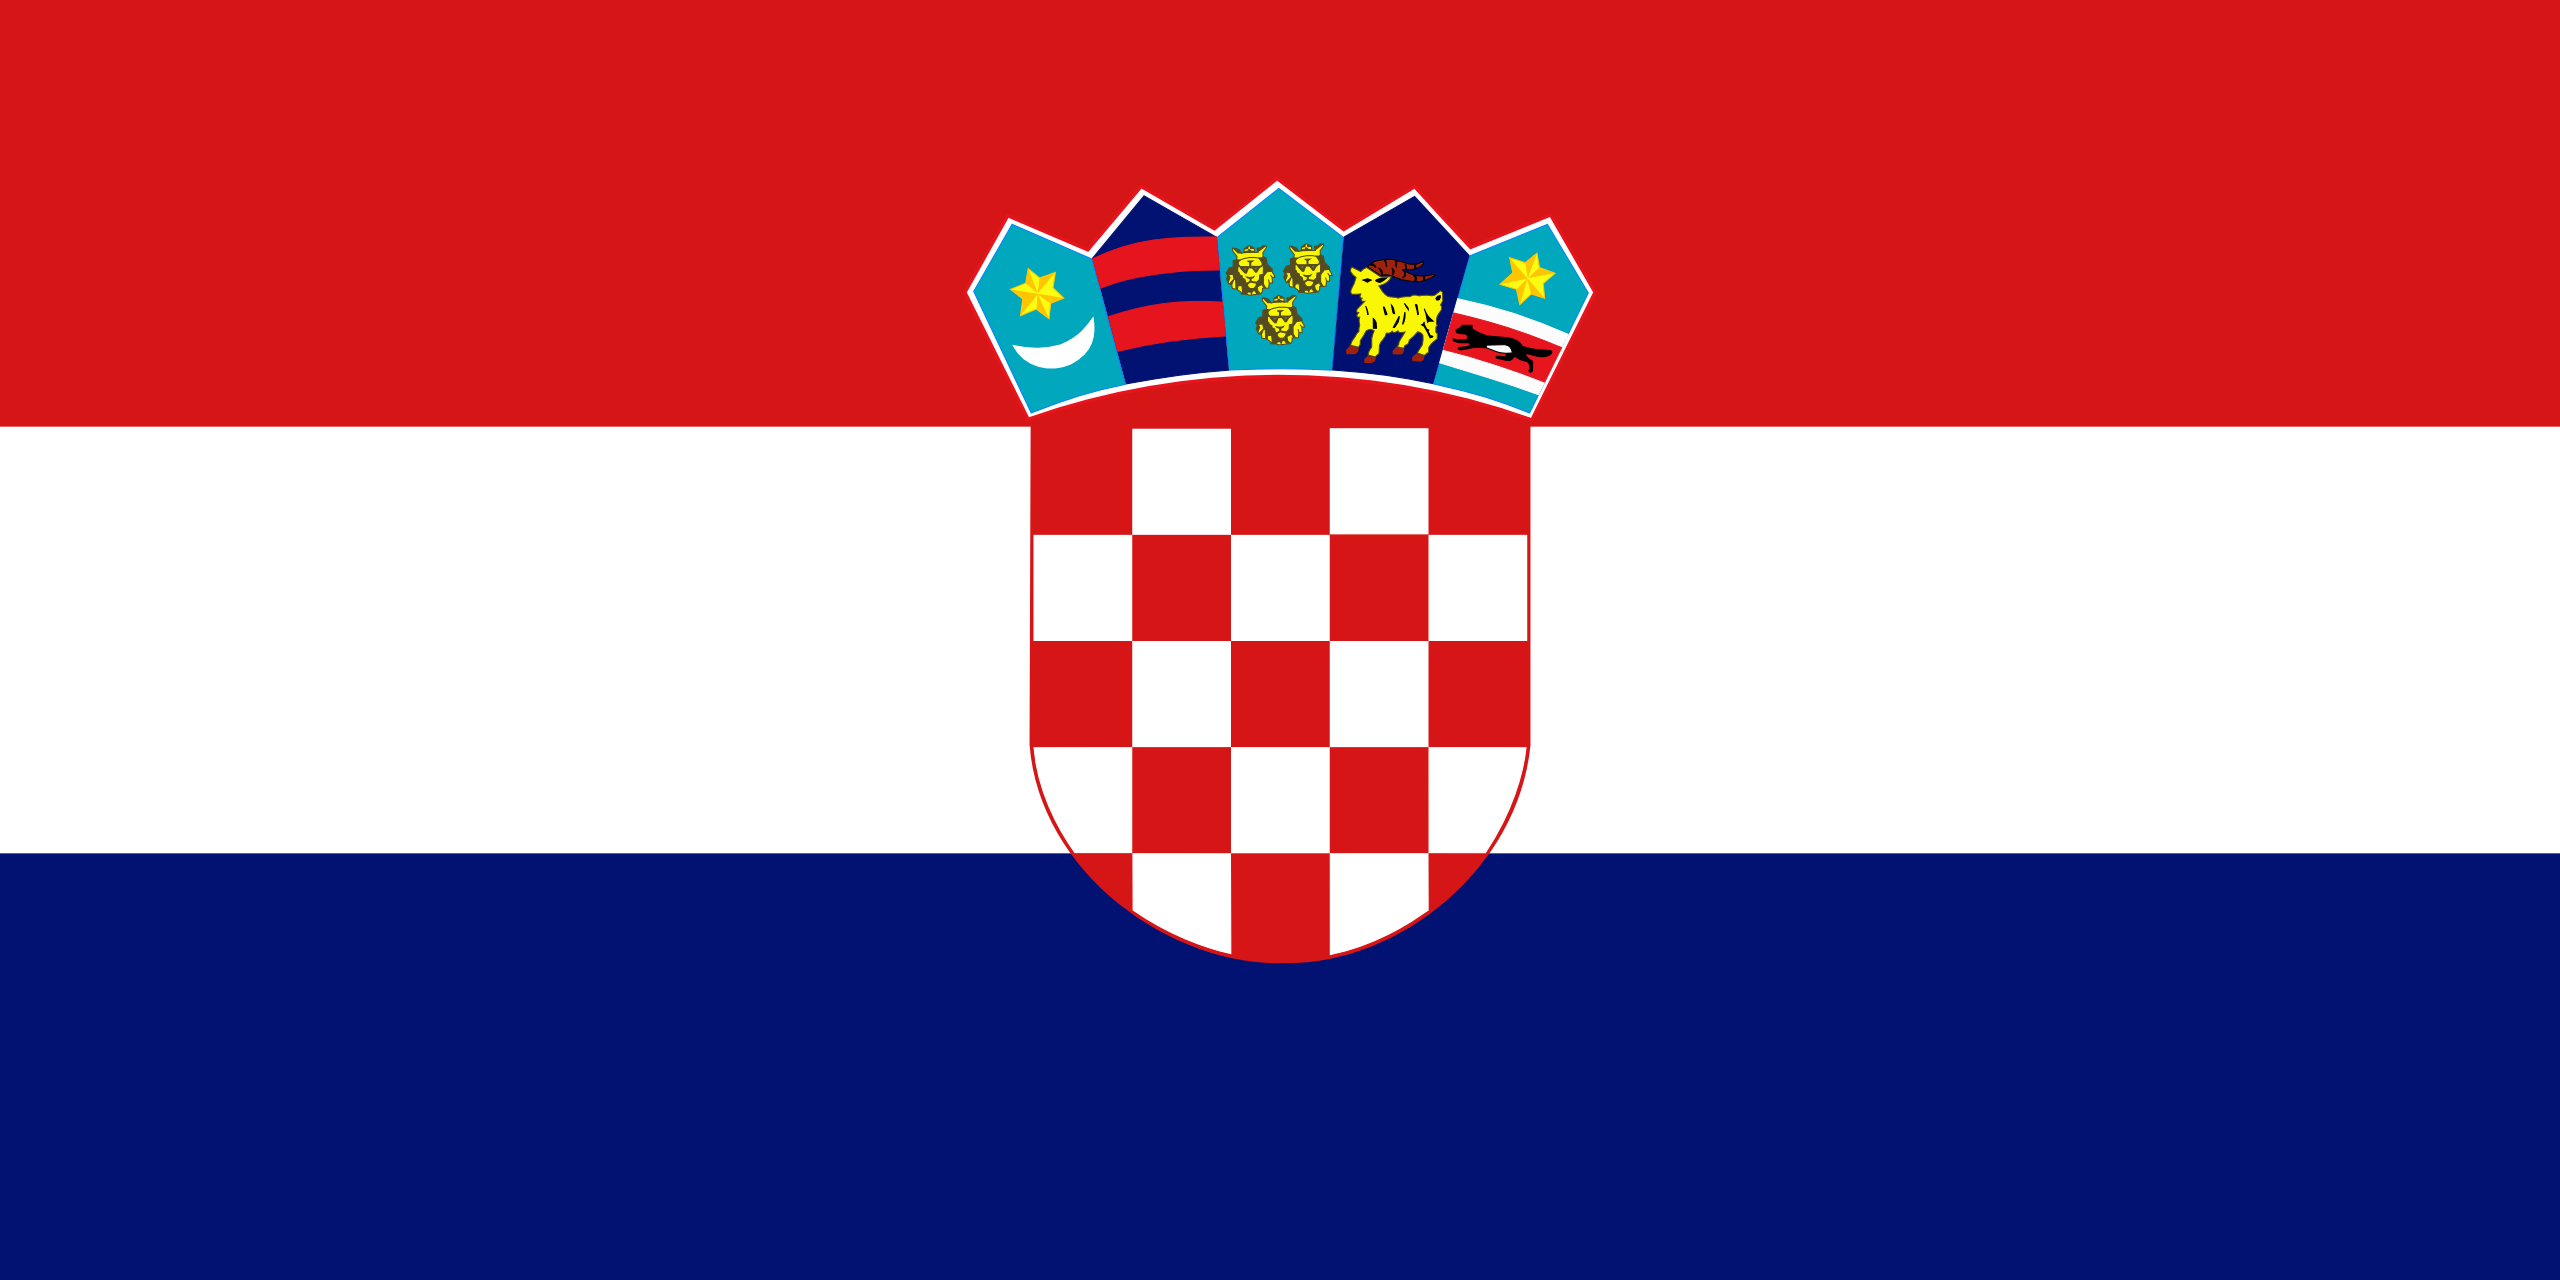 Kroatien, Land, Emblem, Logo, Symbol - Wallpaper HD - Prof.-falken.com